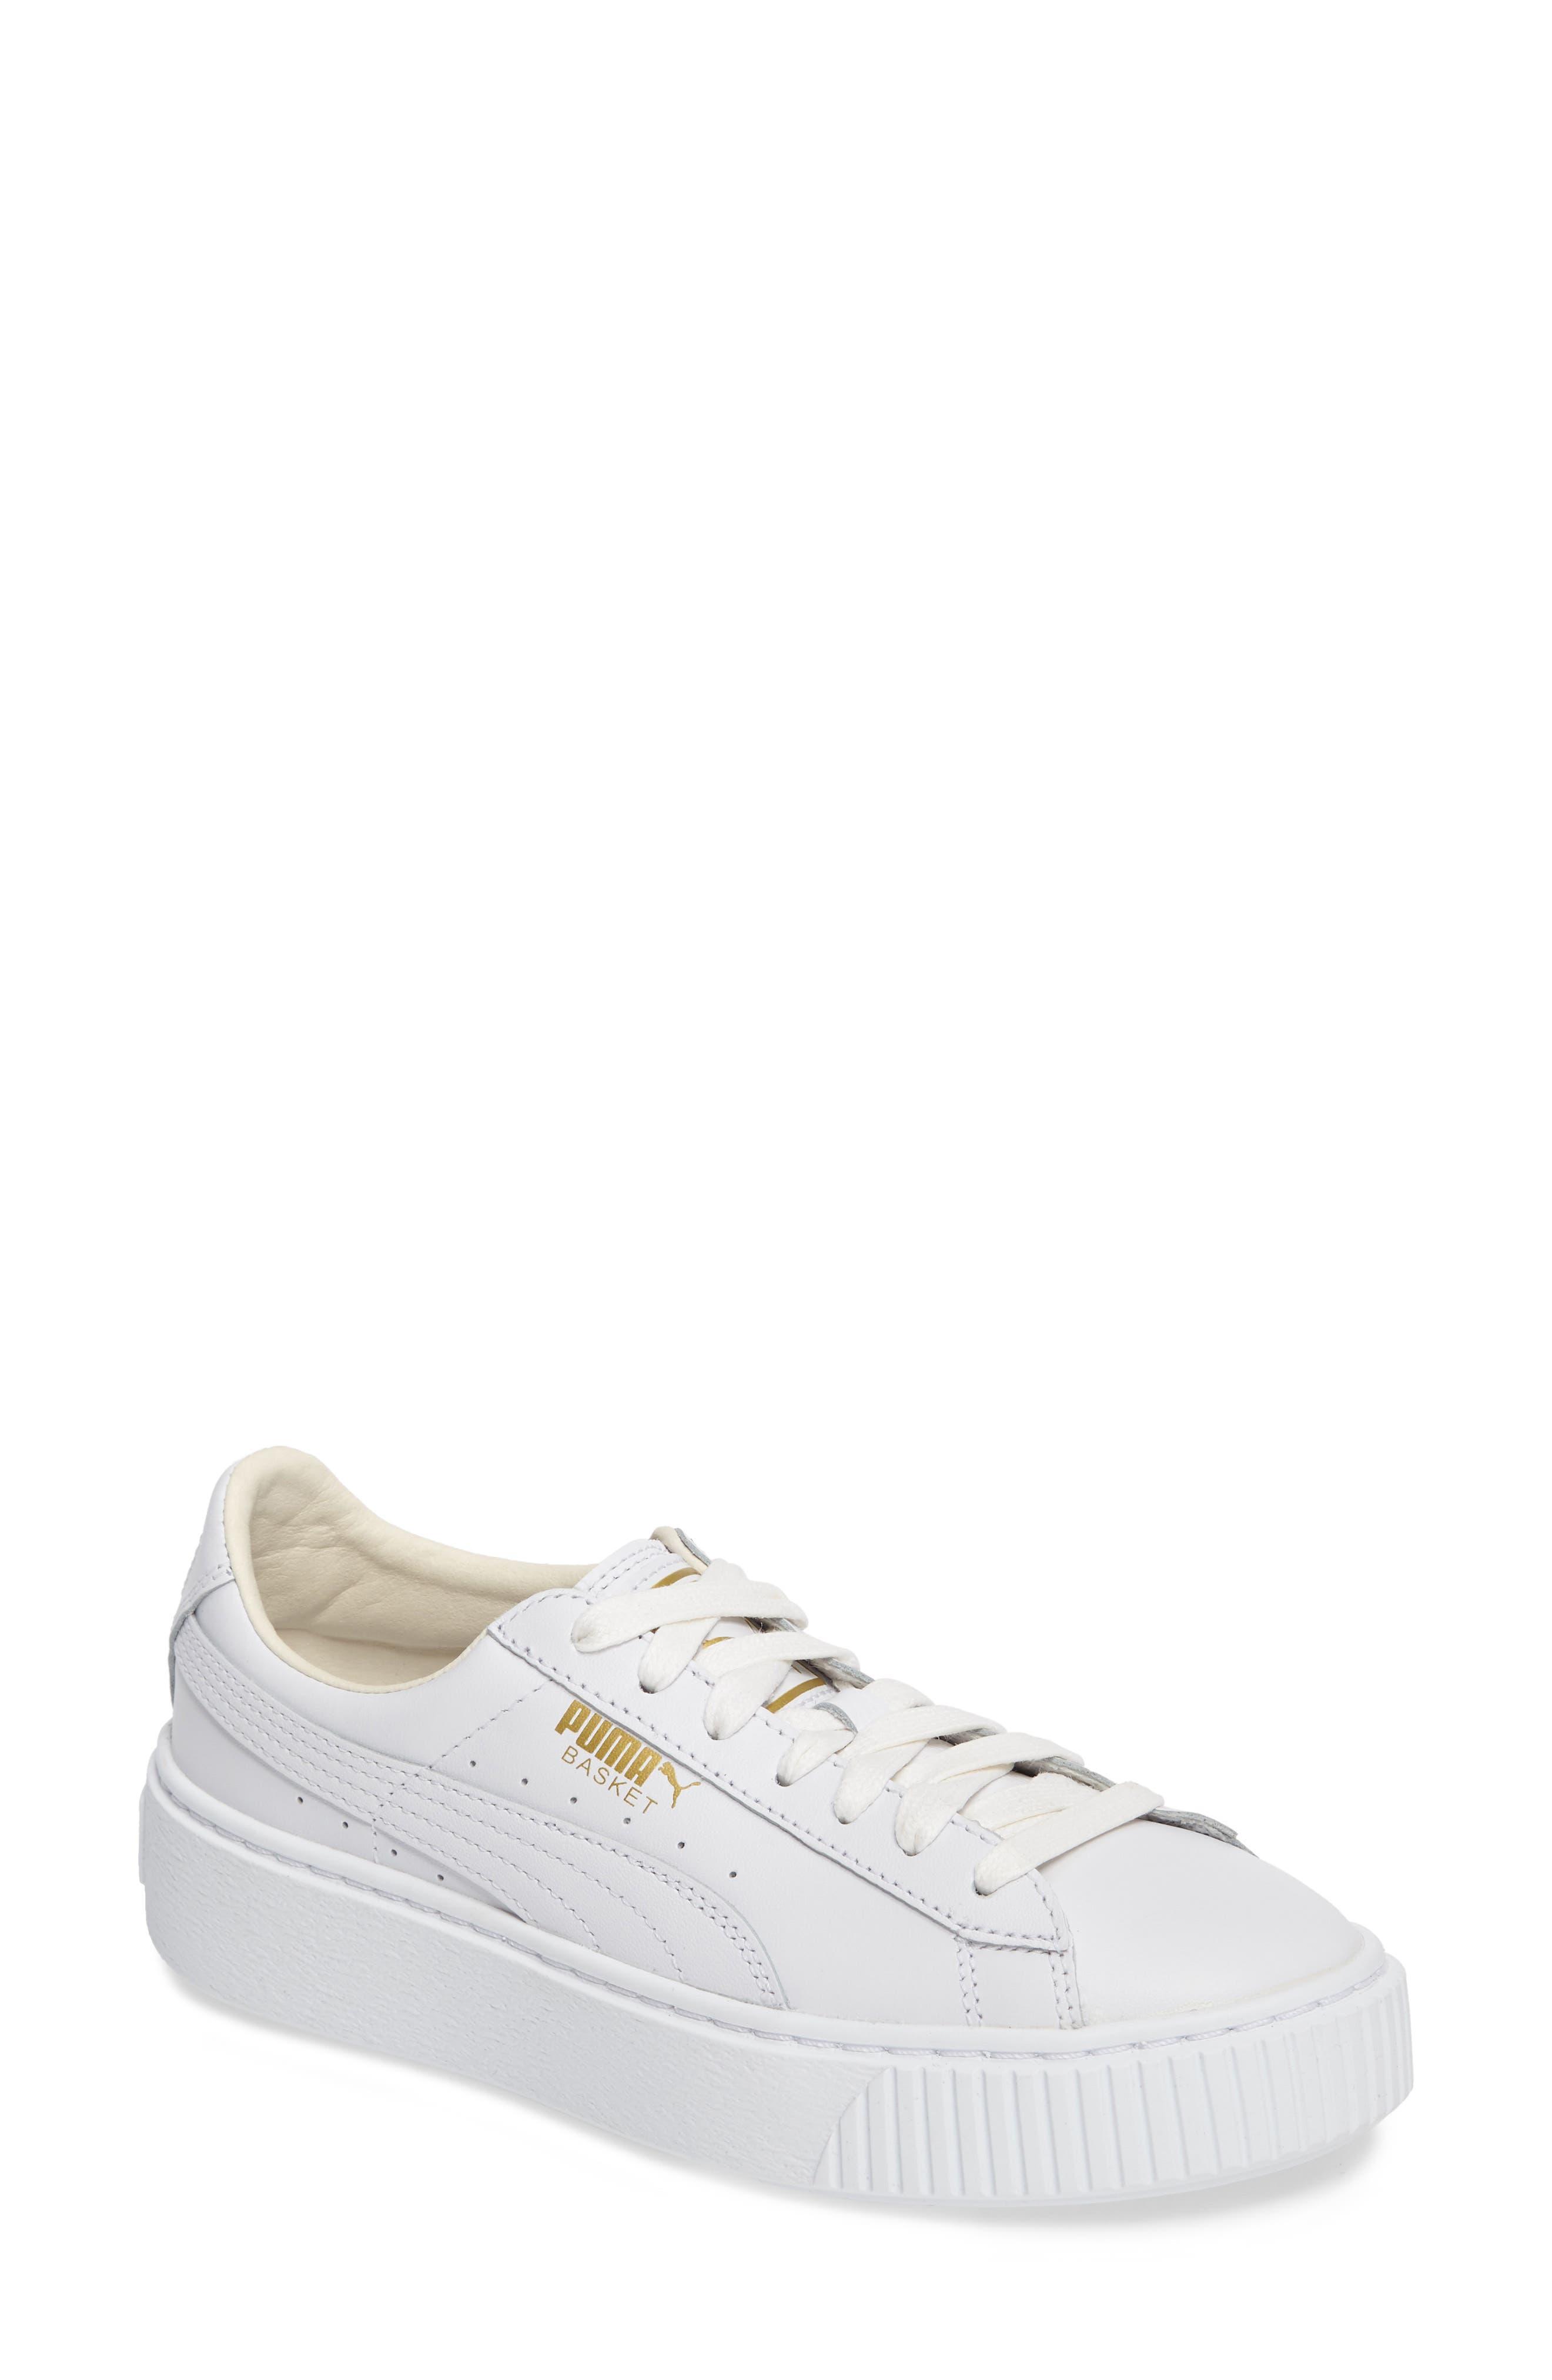 puma platform sneakers. main image - puma basket platform sneaker (women) puma sneakers nordstrom